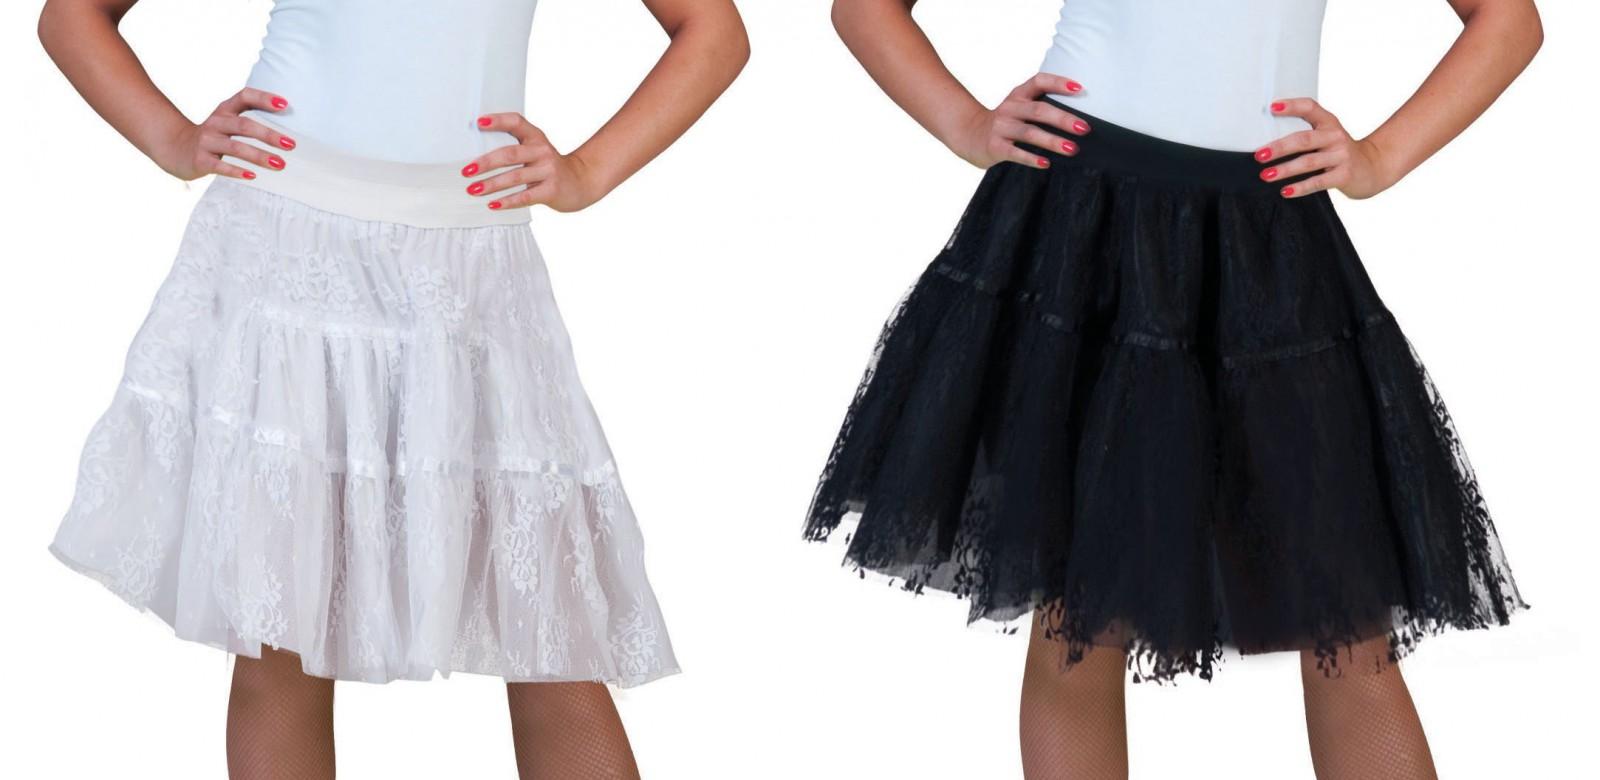 huge selection of 34225 85f7c Kostüm Tüllrock Petticoat Spitzen Rock Spitzenrock Tutu schwarz od weiß  Karneval